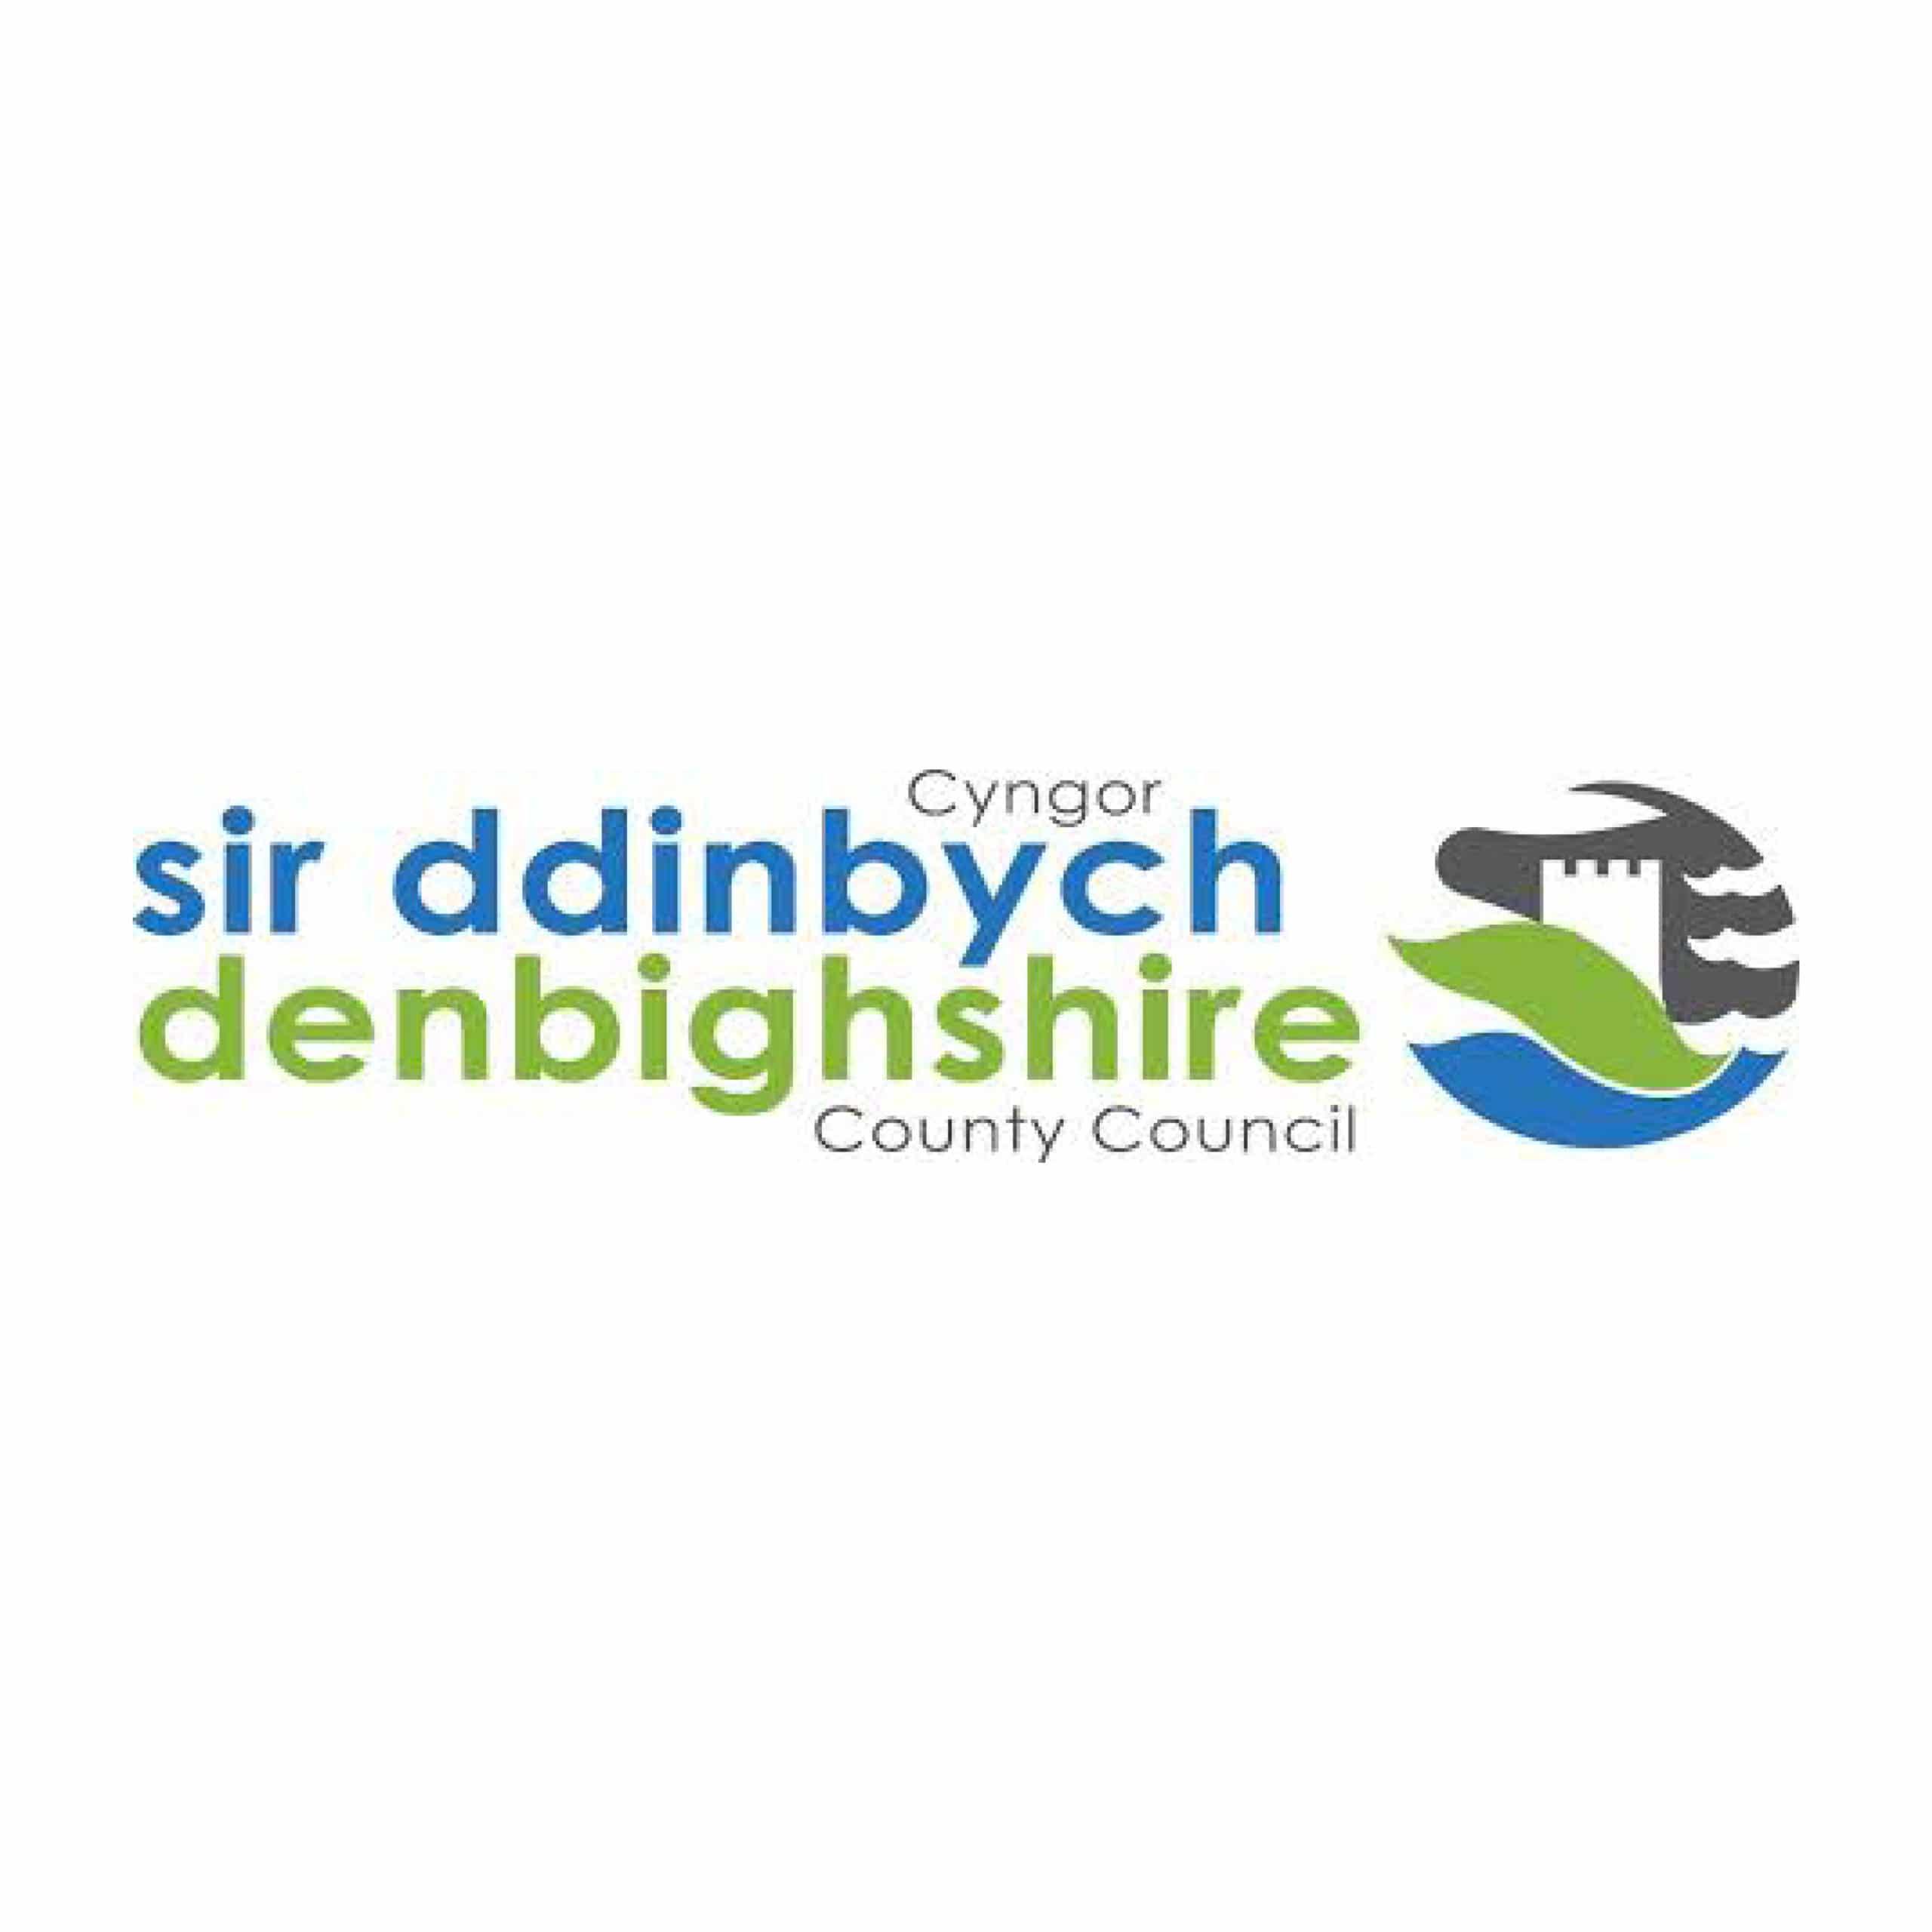 Fineline Print and Web | North Wales | Portfolio | Denbighshire County Council